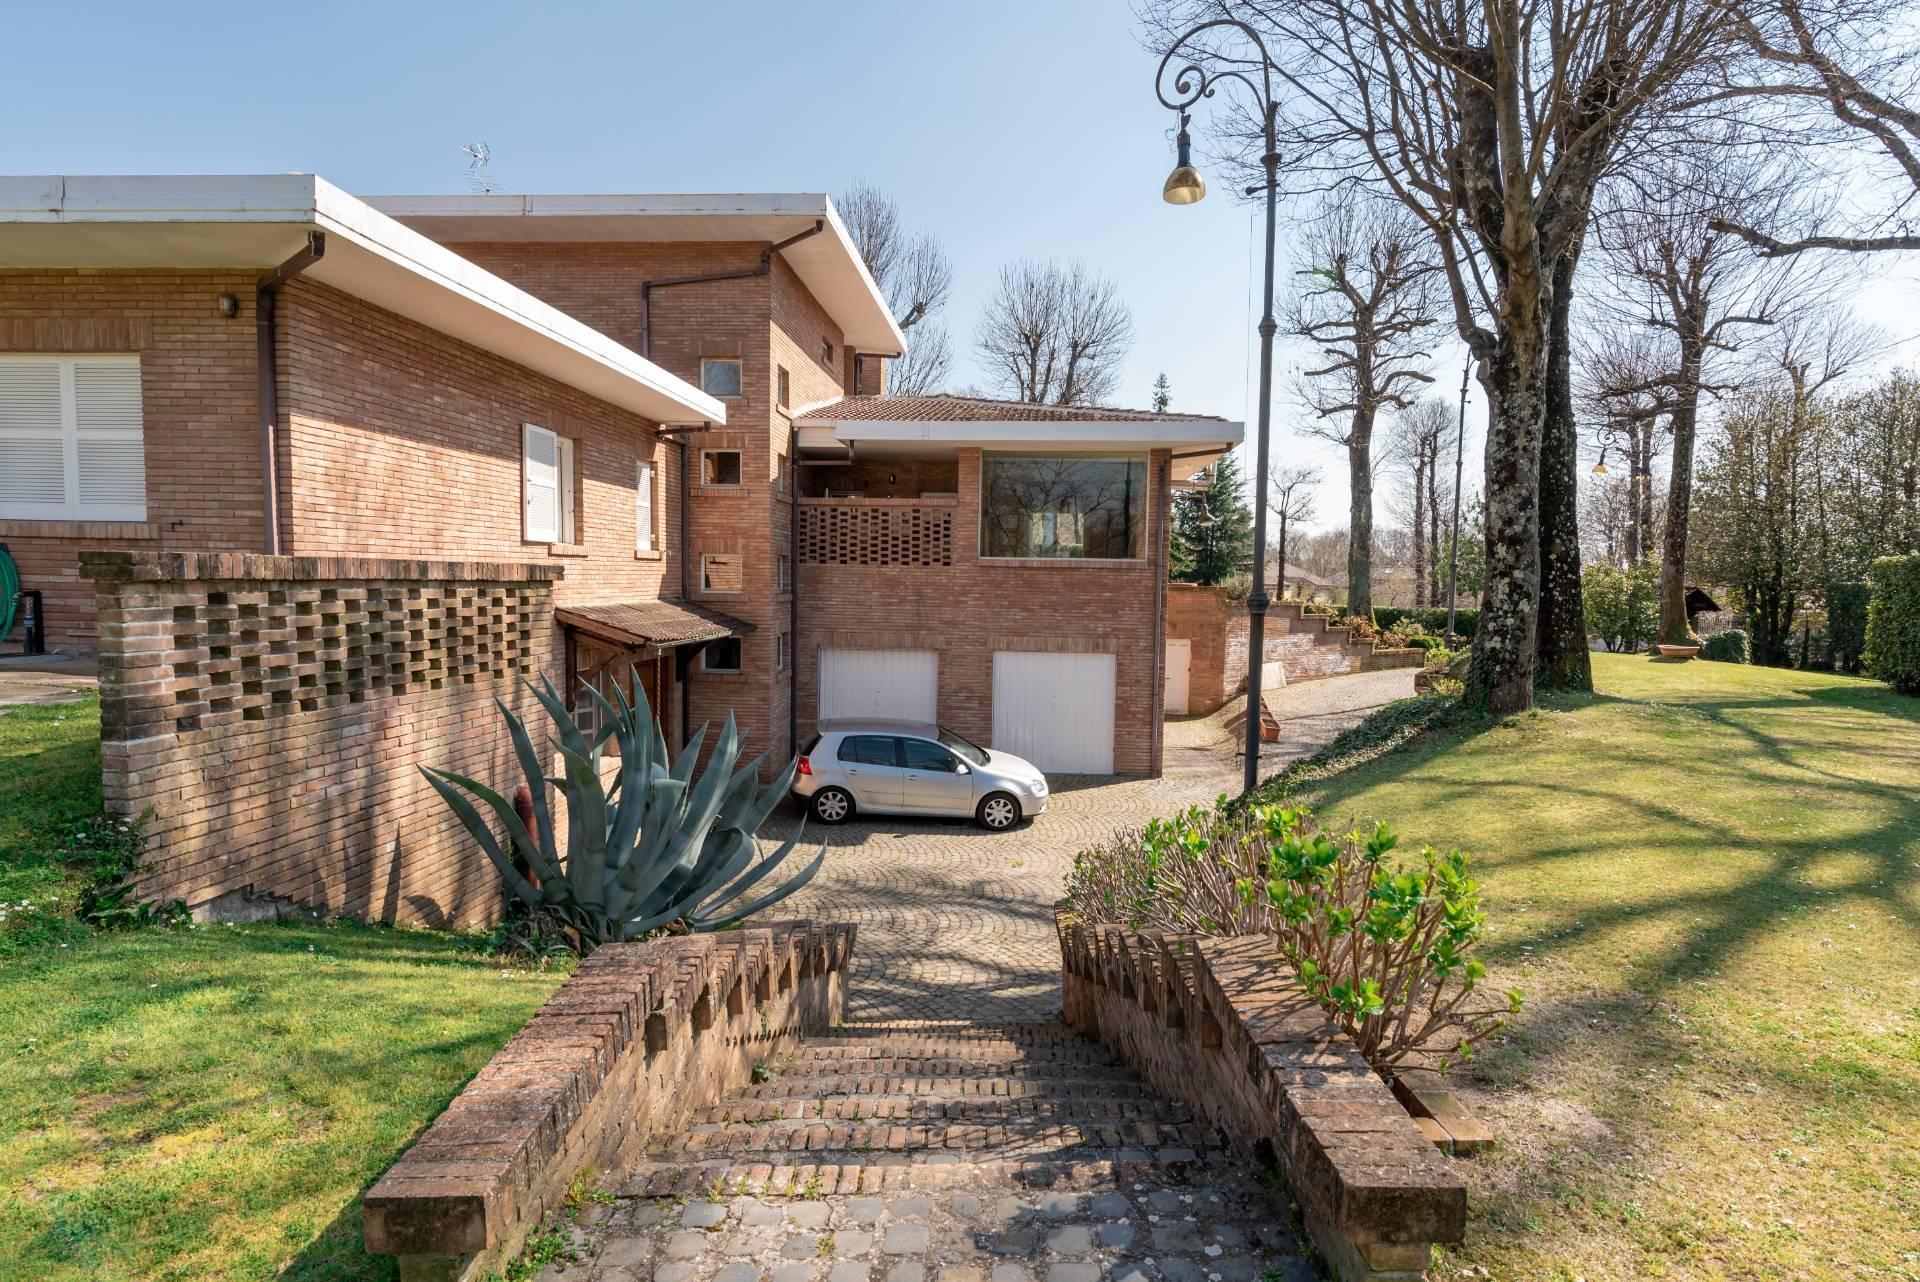 Villa in Vendita a Ariccia: 5 locali, 583 mq - Foto 29